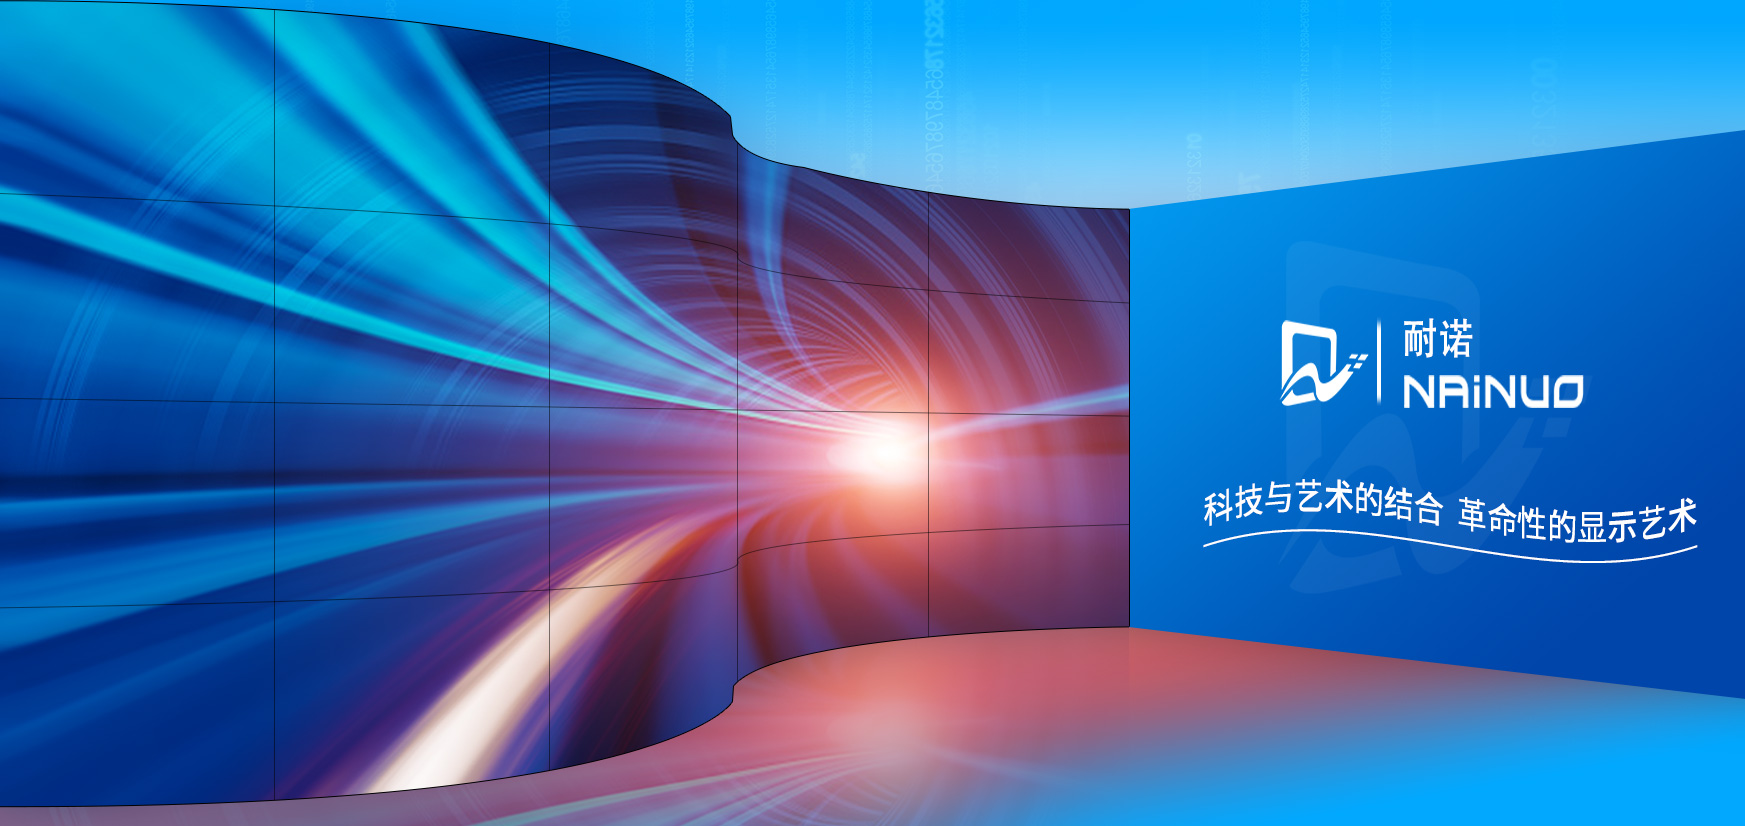 OLED柔性拼接屏-65寸液晶拼接屏-雙屏幕拼接-拼接屏